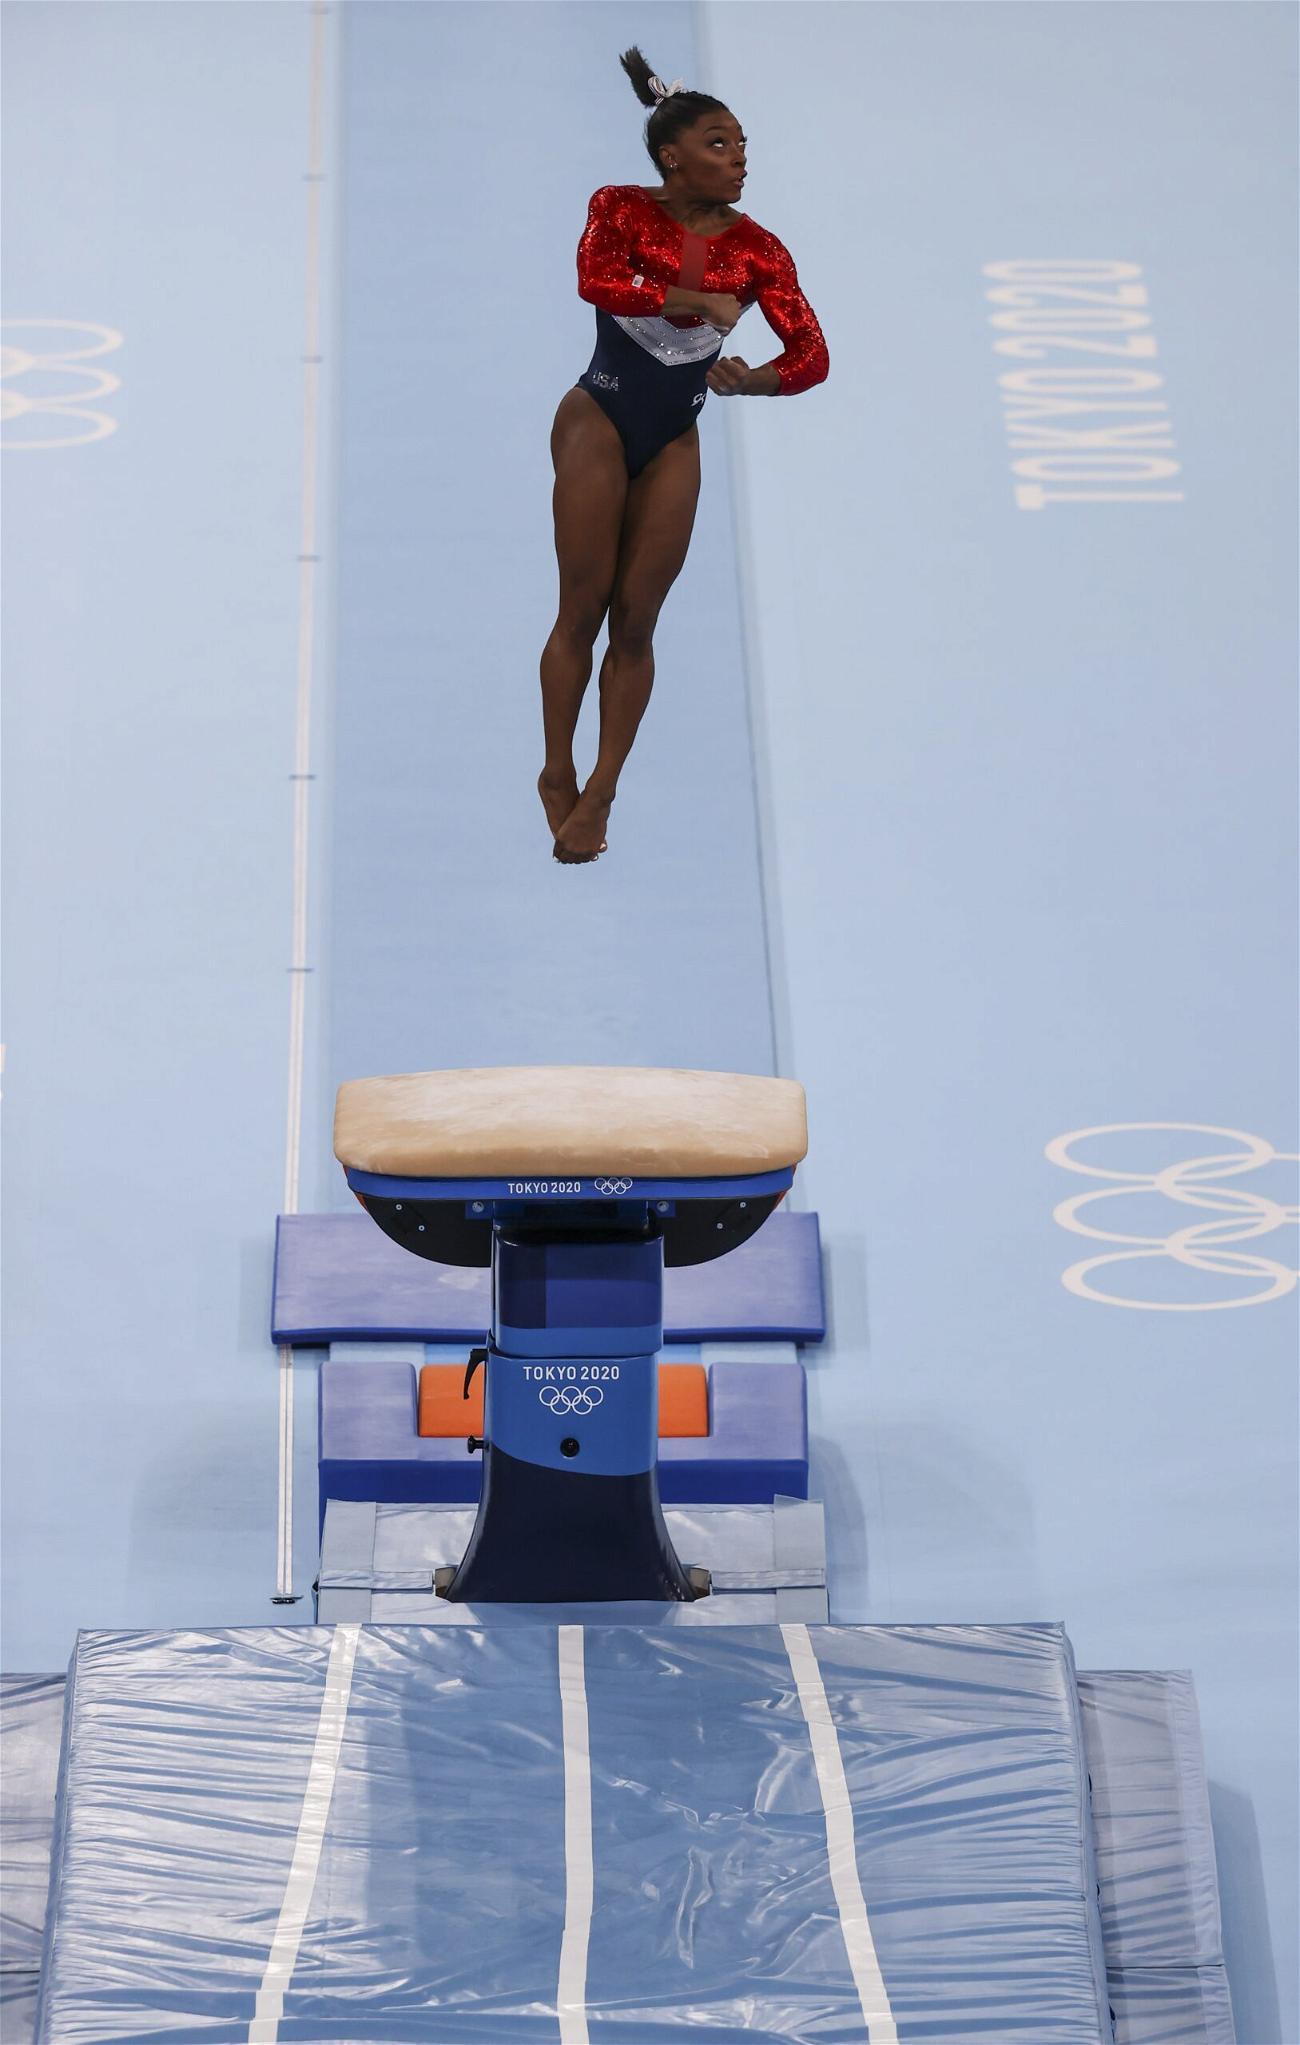 Olympic Games Tokyo 2020 Simone Biles